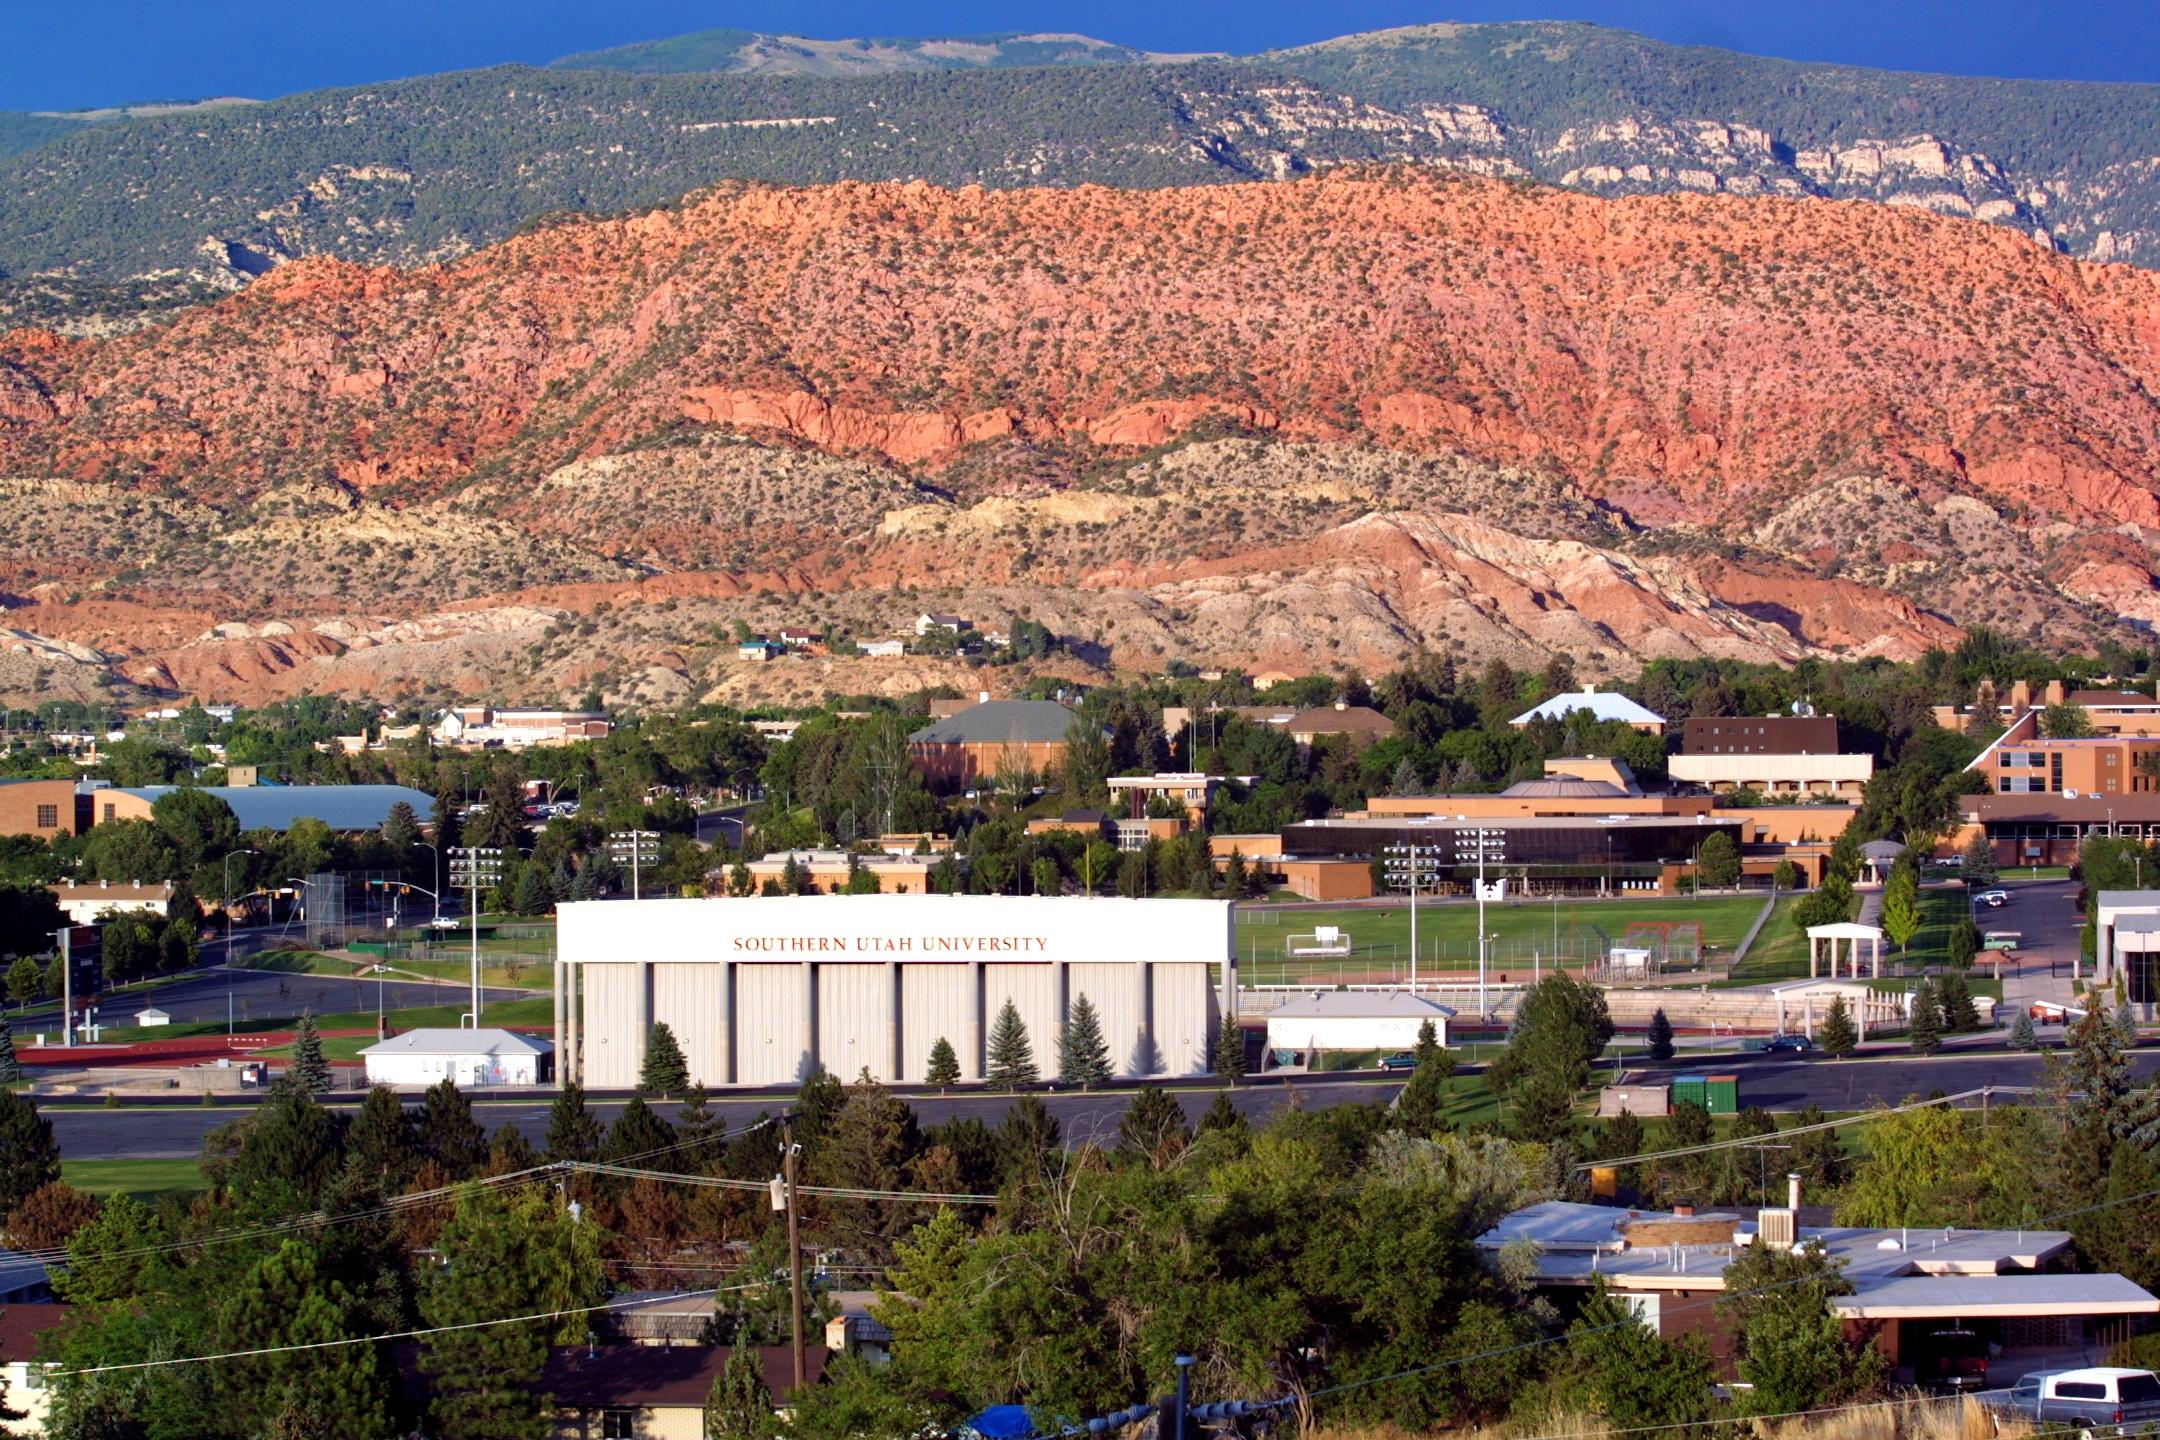 Southern Utah University today.